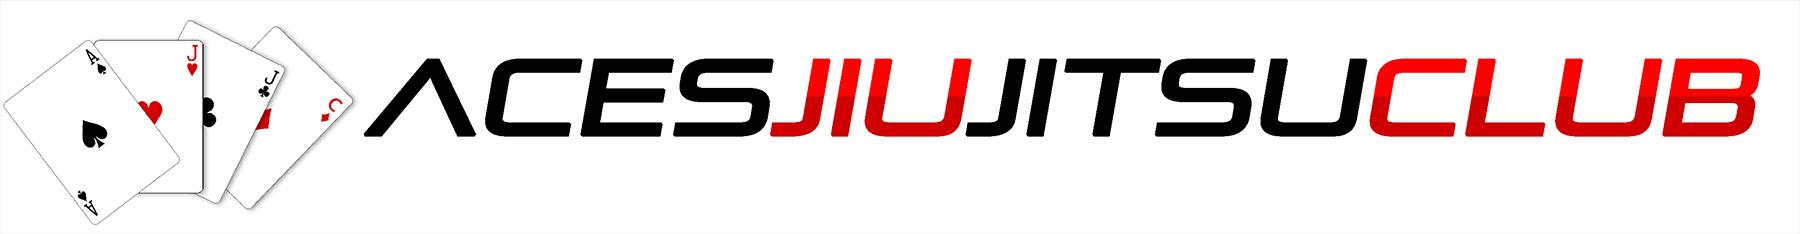 Aces Jiu Jitsu Club logo banner